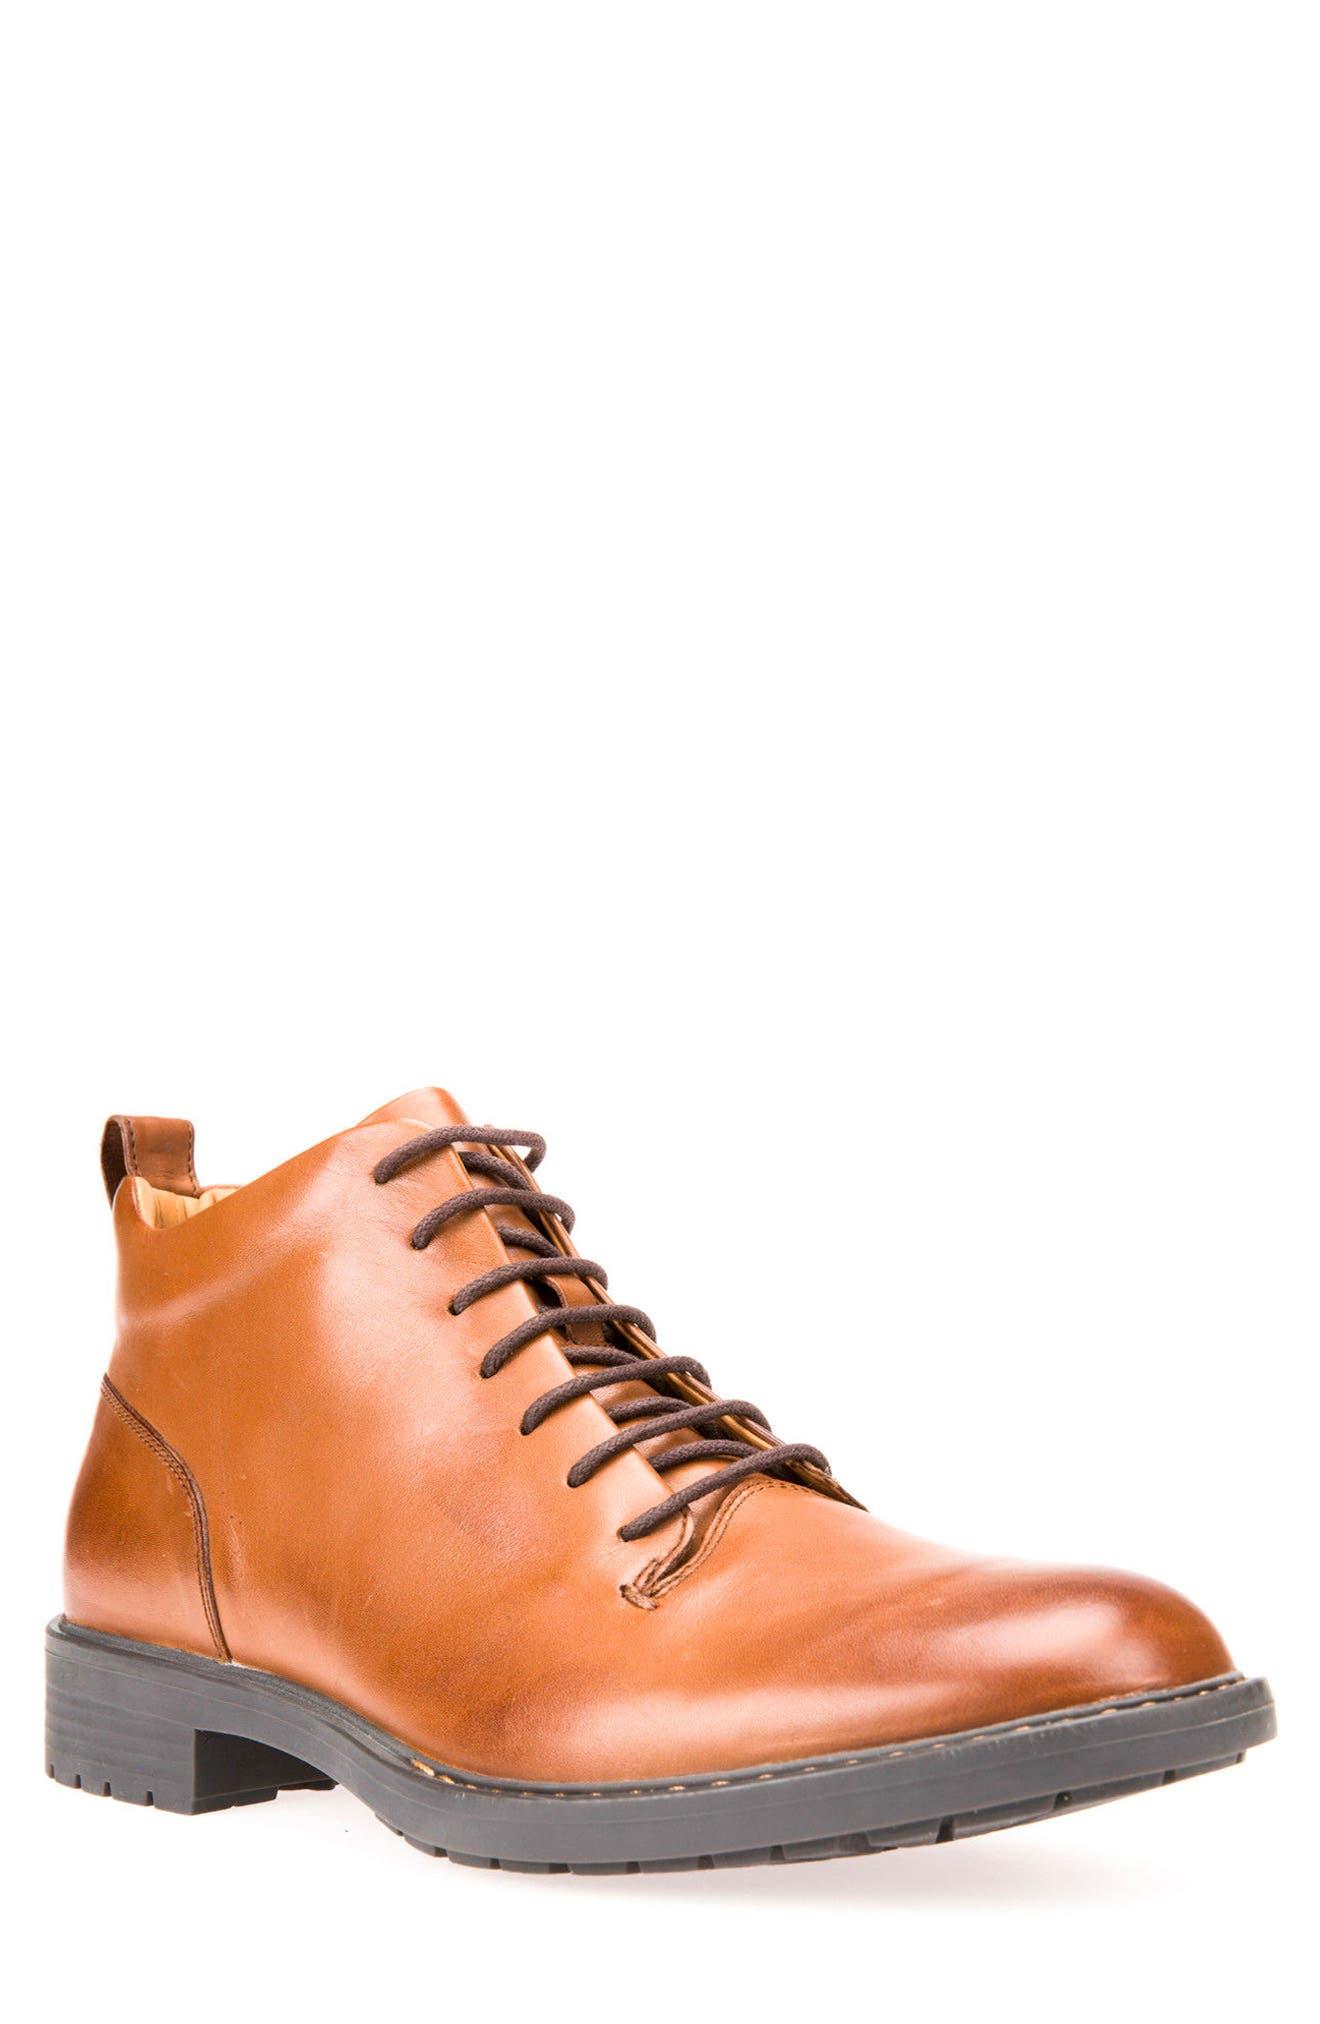 Alternate Image 1 Selected - Geox Kapsian Plain Toe Boot (Men)